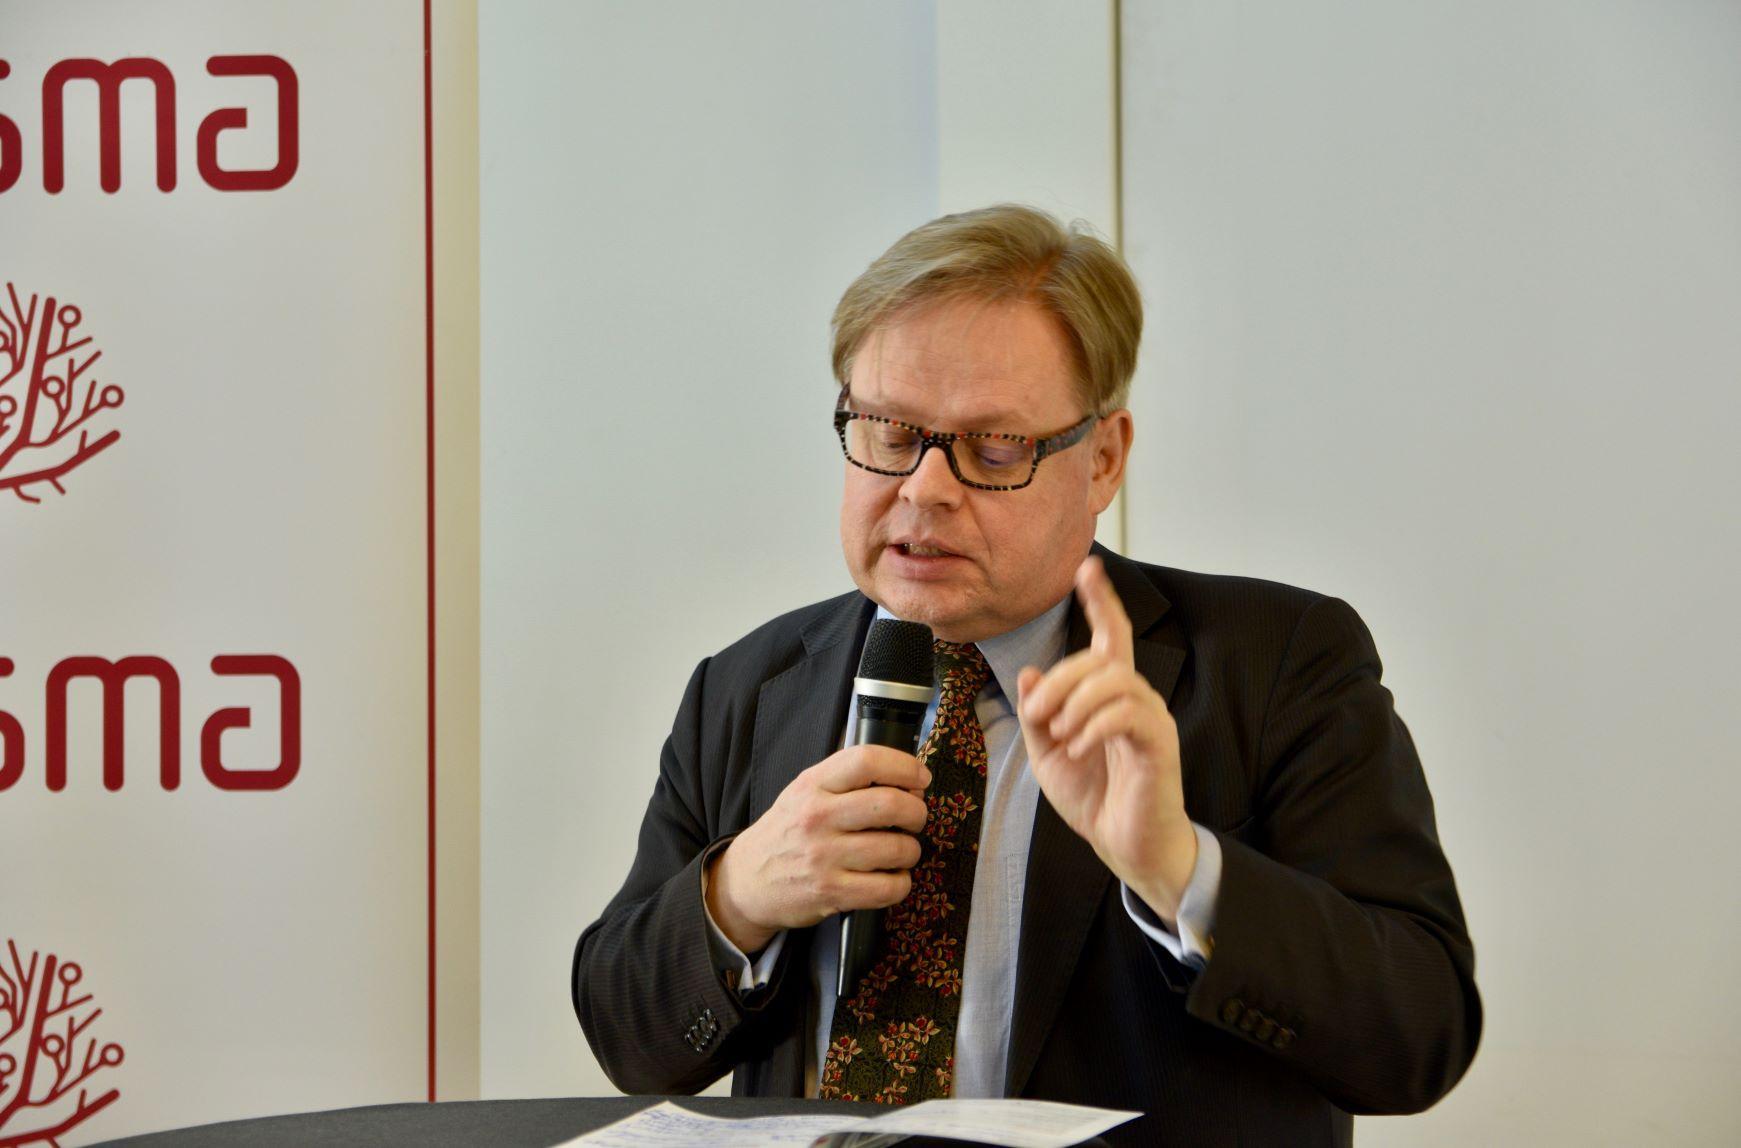 En man sitter med mikrofon